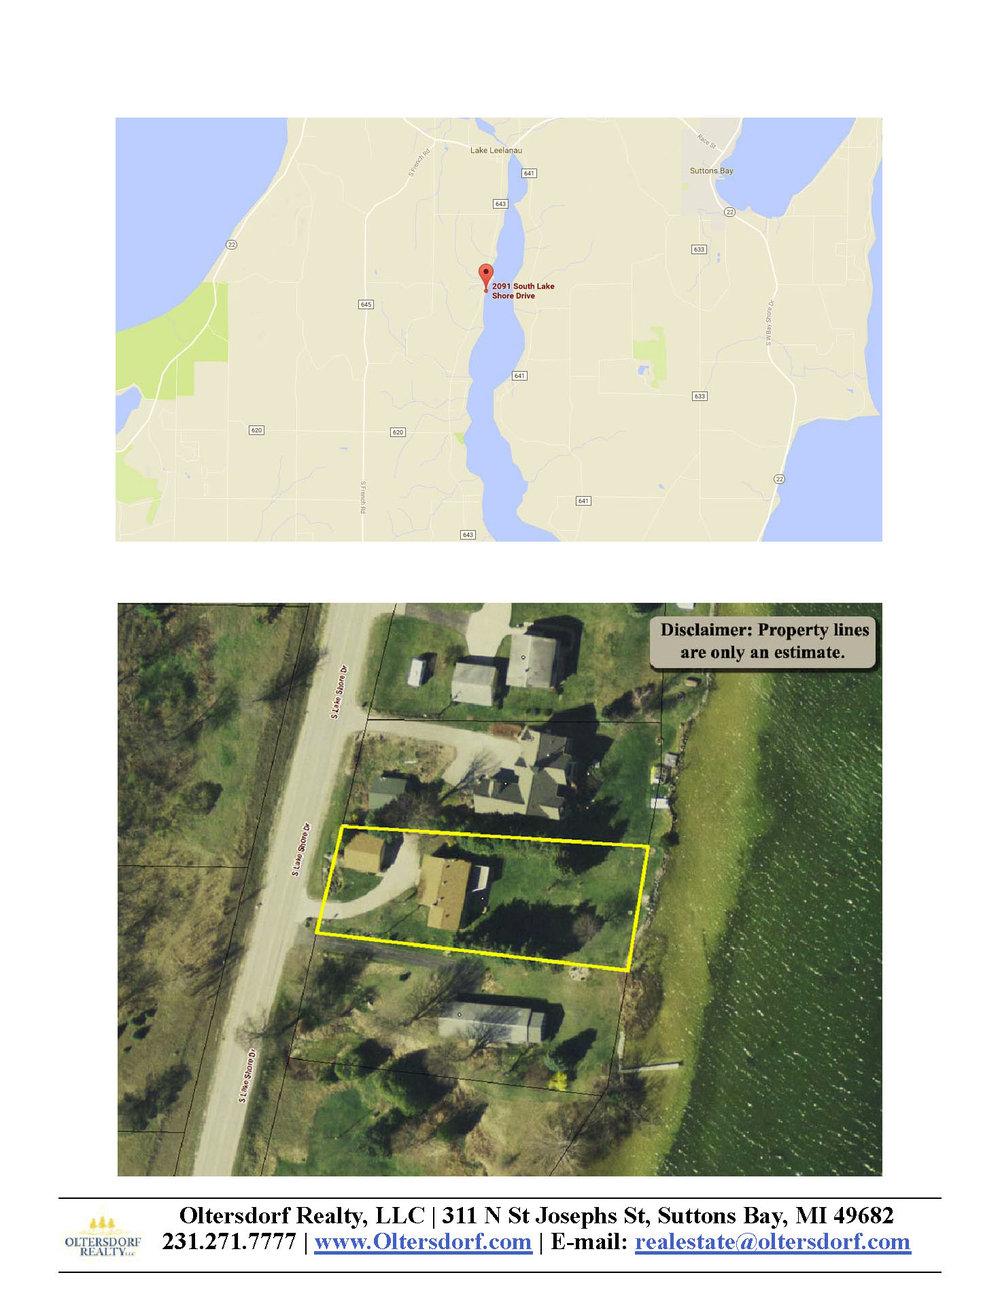 2091 S Lake Shore Drive - Oltersdorf Realty LLC Marketing Packet_Page_09.jpg